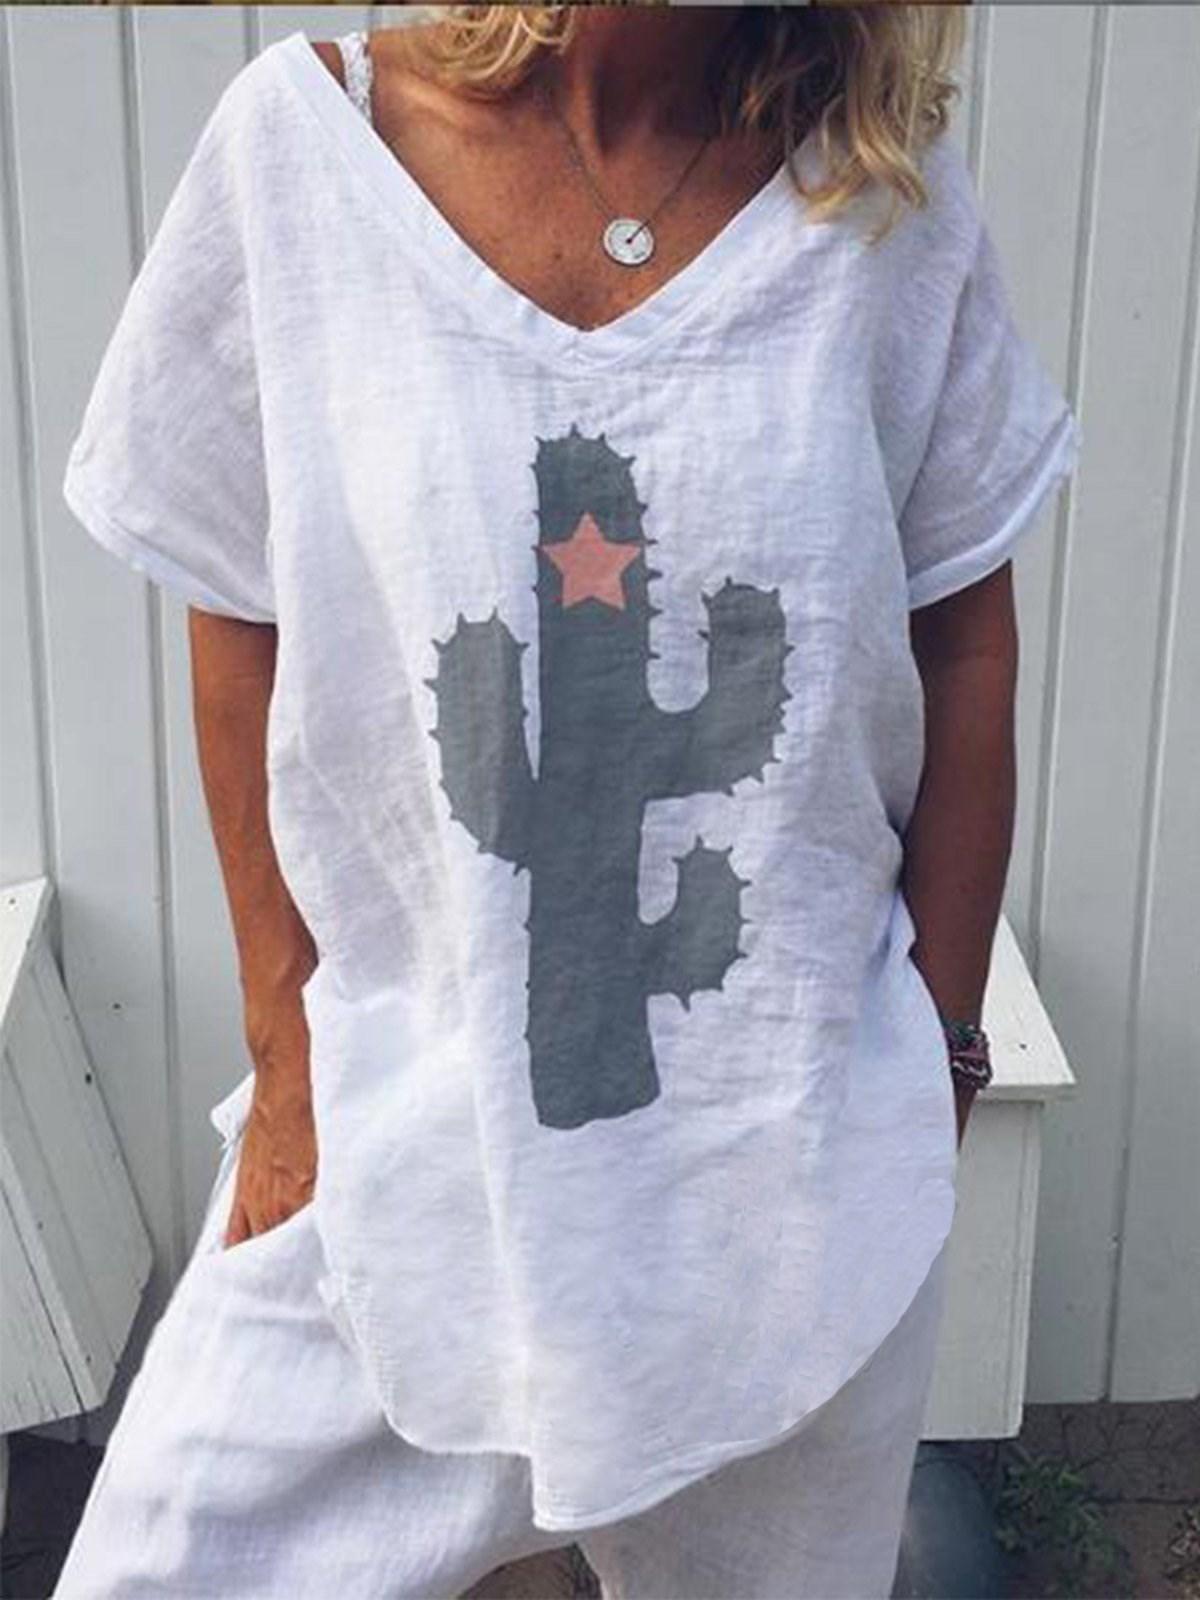 Basic Tee T-shirt Women Casual V-neck Summer Top Hipster White T Shirt